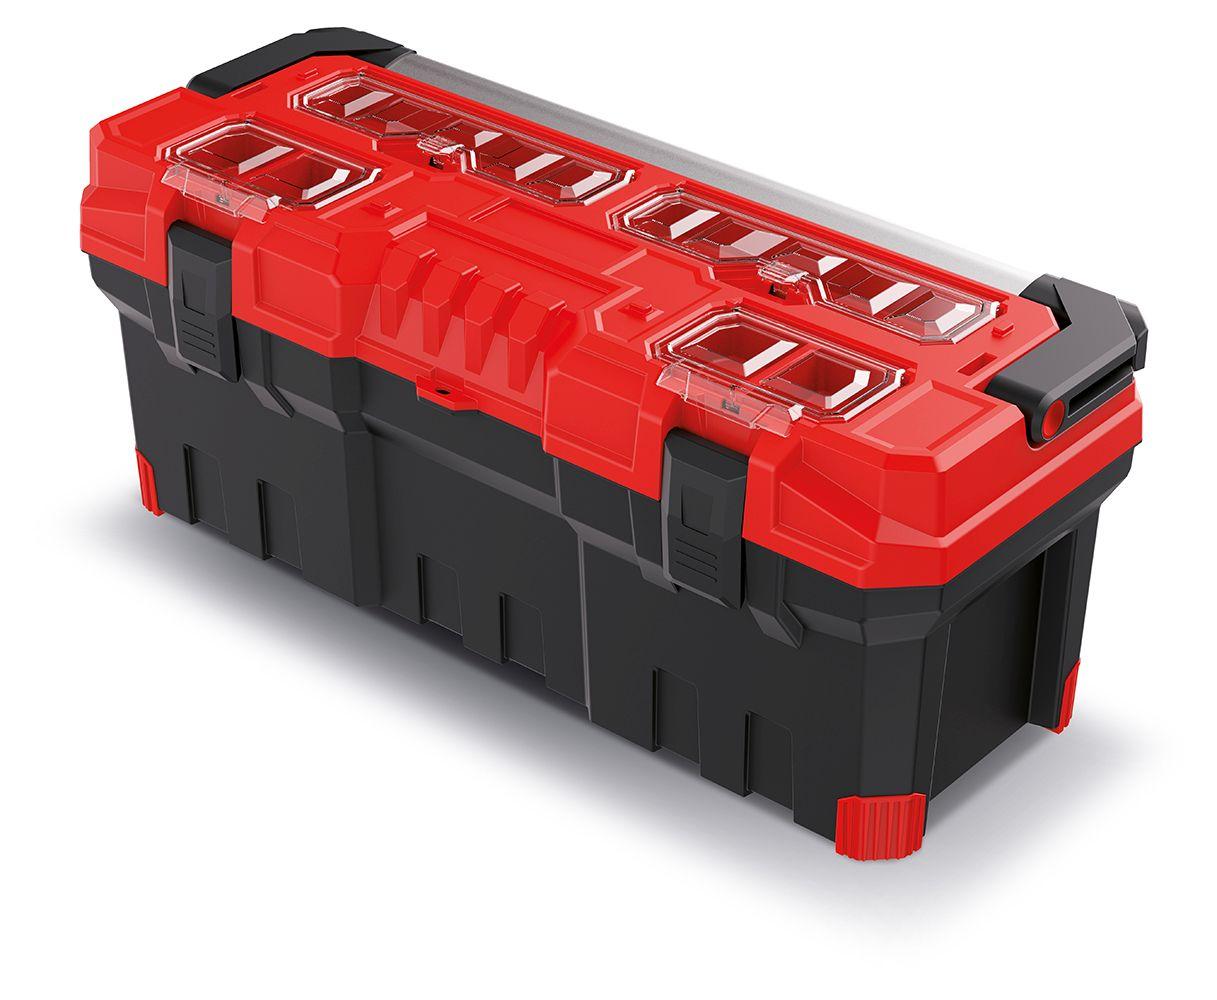 PROSPERPLAST Kufr na nářadí s kov. držadlem TITAN PLUS červený 752x300x304